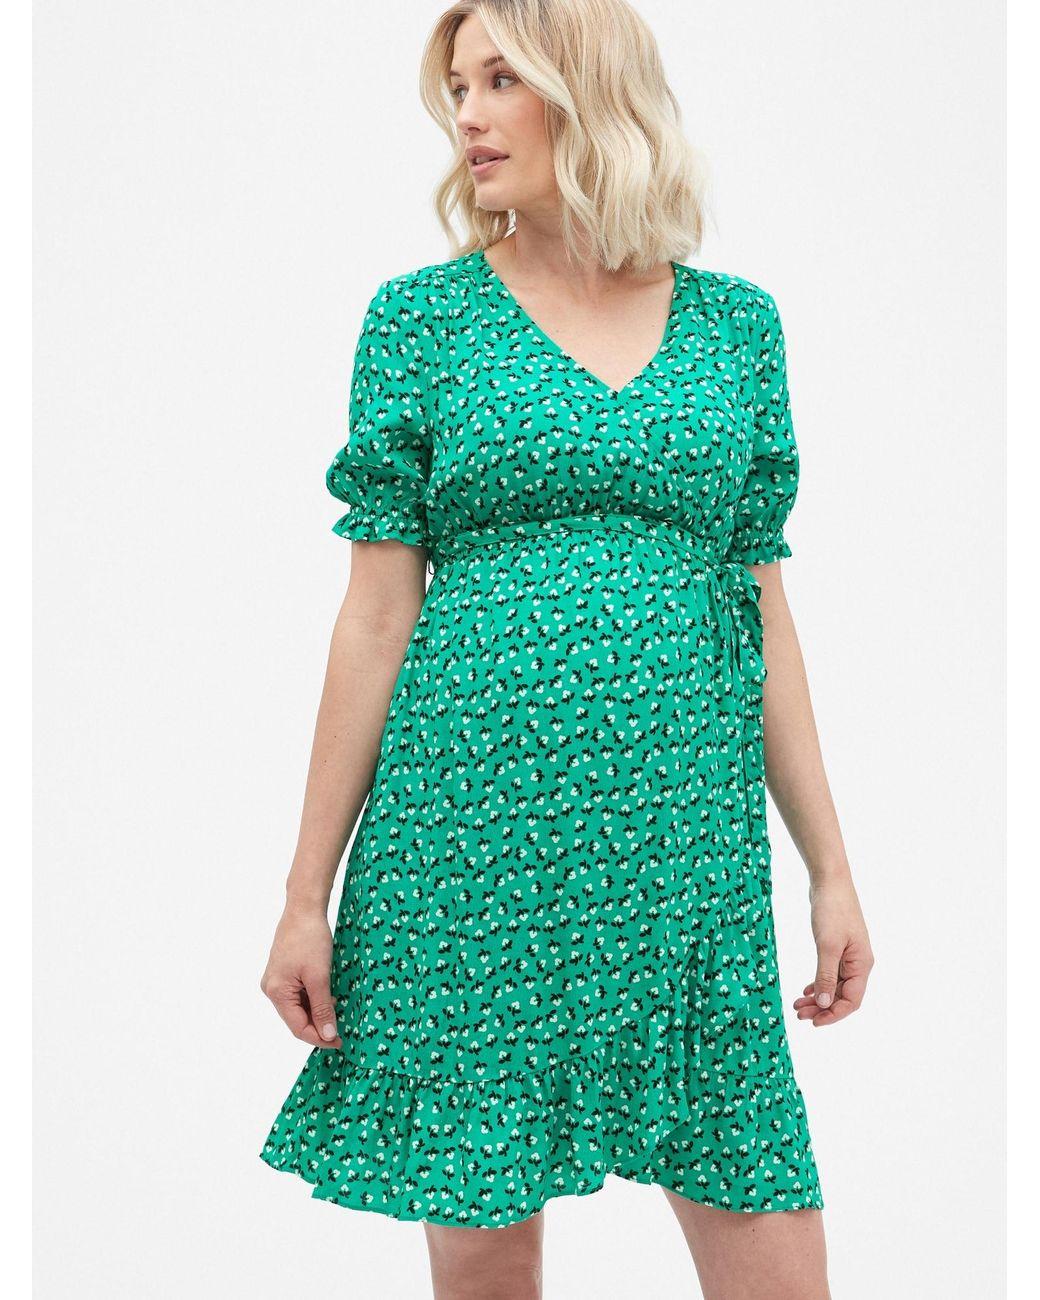 a6b67a70b8 Gap Maternity Ruffle Print Wrap Dress in Green - Lyst